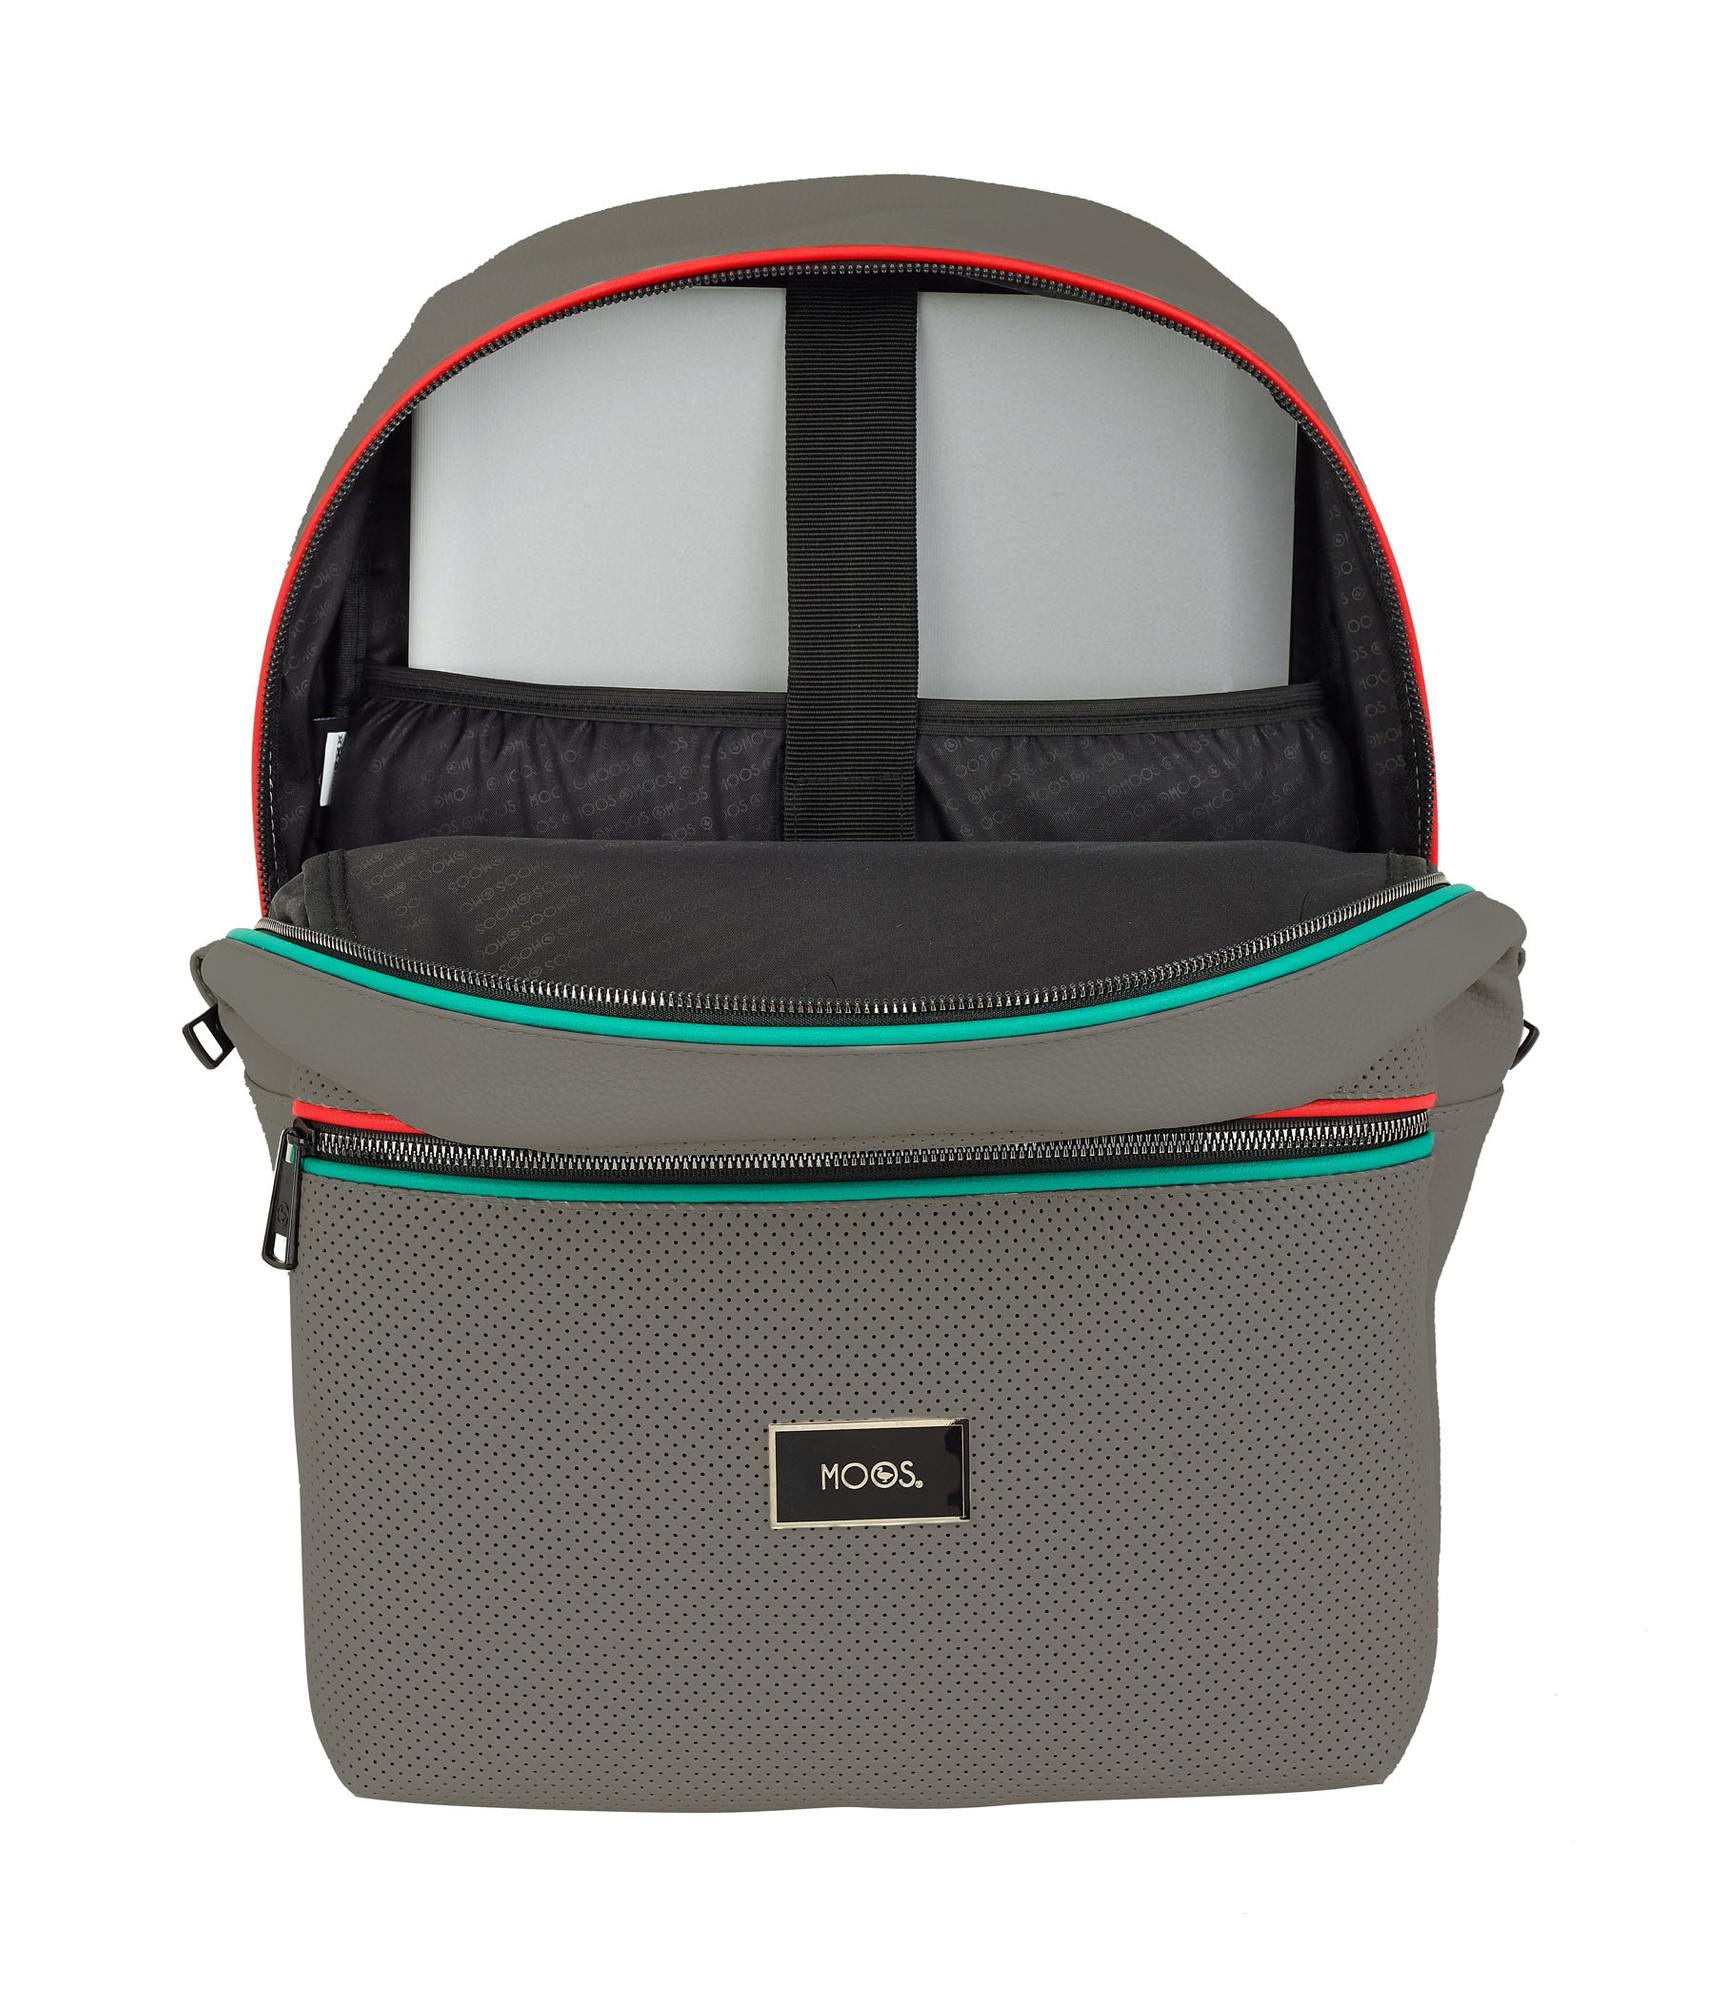 8251c50cf5e54f Laptop Rucksack Backpack 15,6'' MOOS Capsula Portland Grey ...